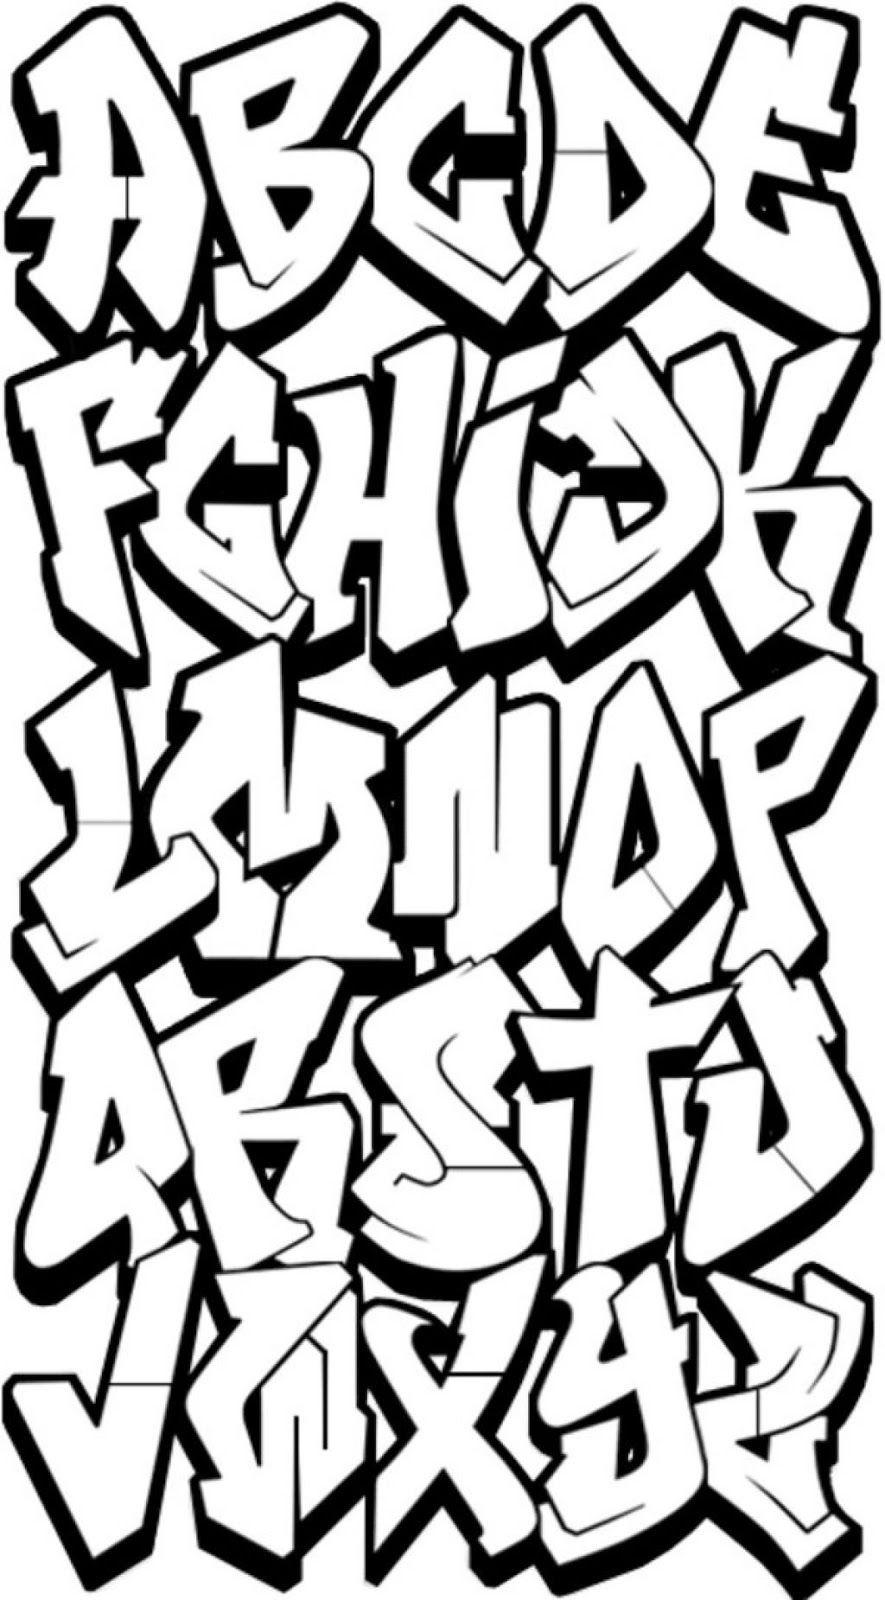 3D Graffiti Letters Az | Typography X In 2019 | Graffiti Alphabet - Free Printable Graffiti Letters Az